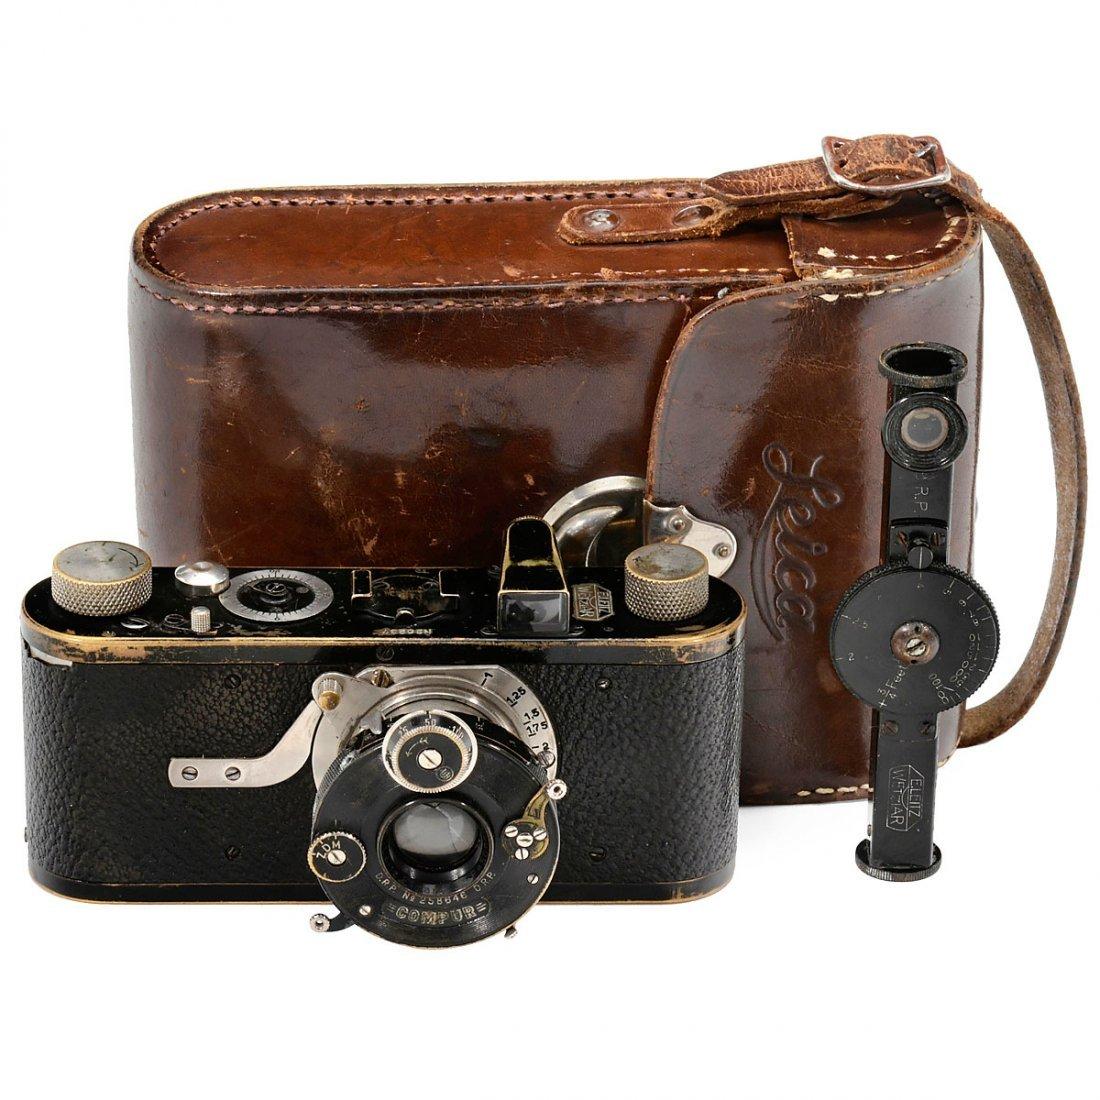 Leica with Dial-Set Compur Shutter, 1931